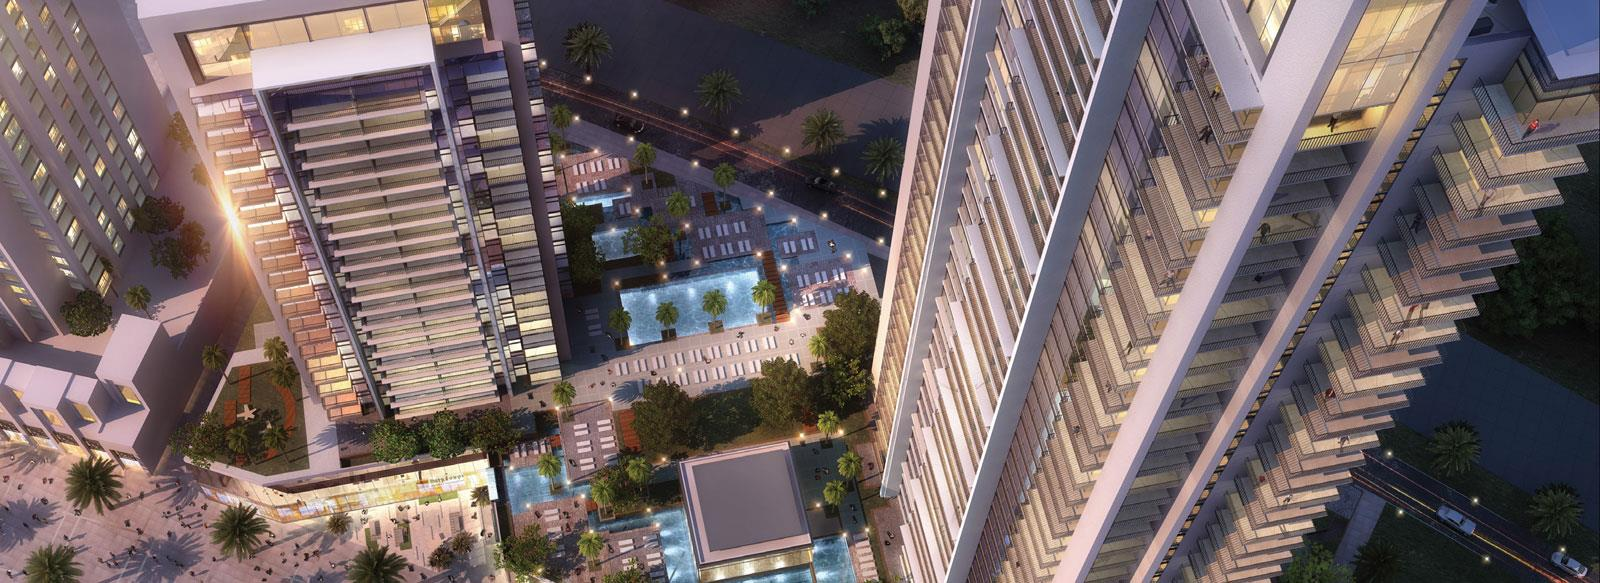 Offering 1, 2, 3 Bedroom Luxury Apartments